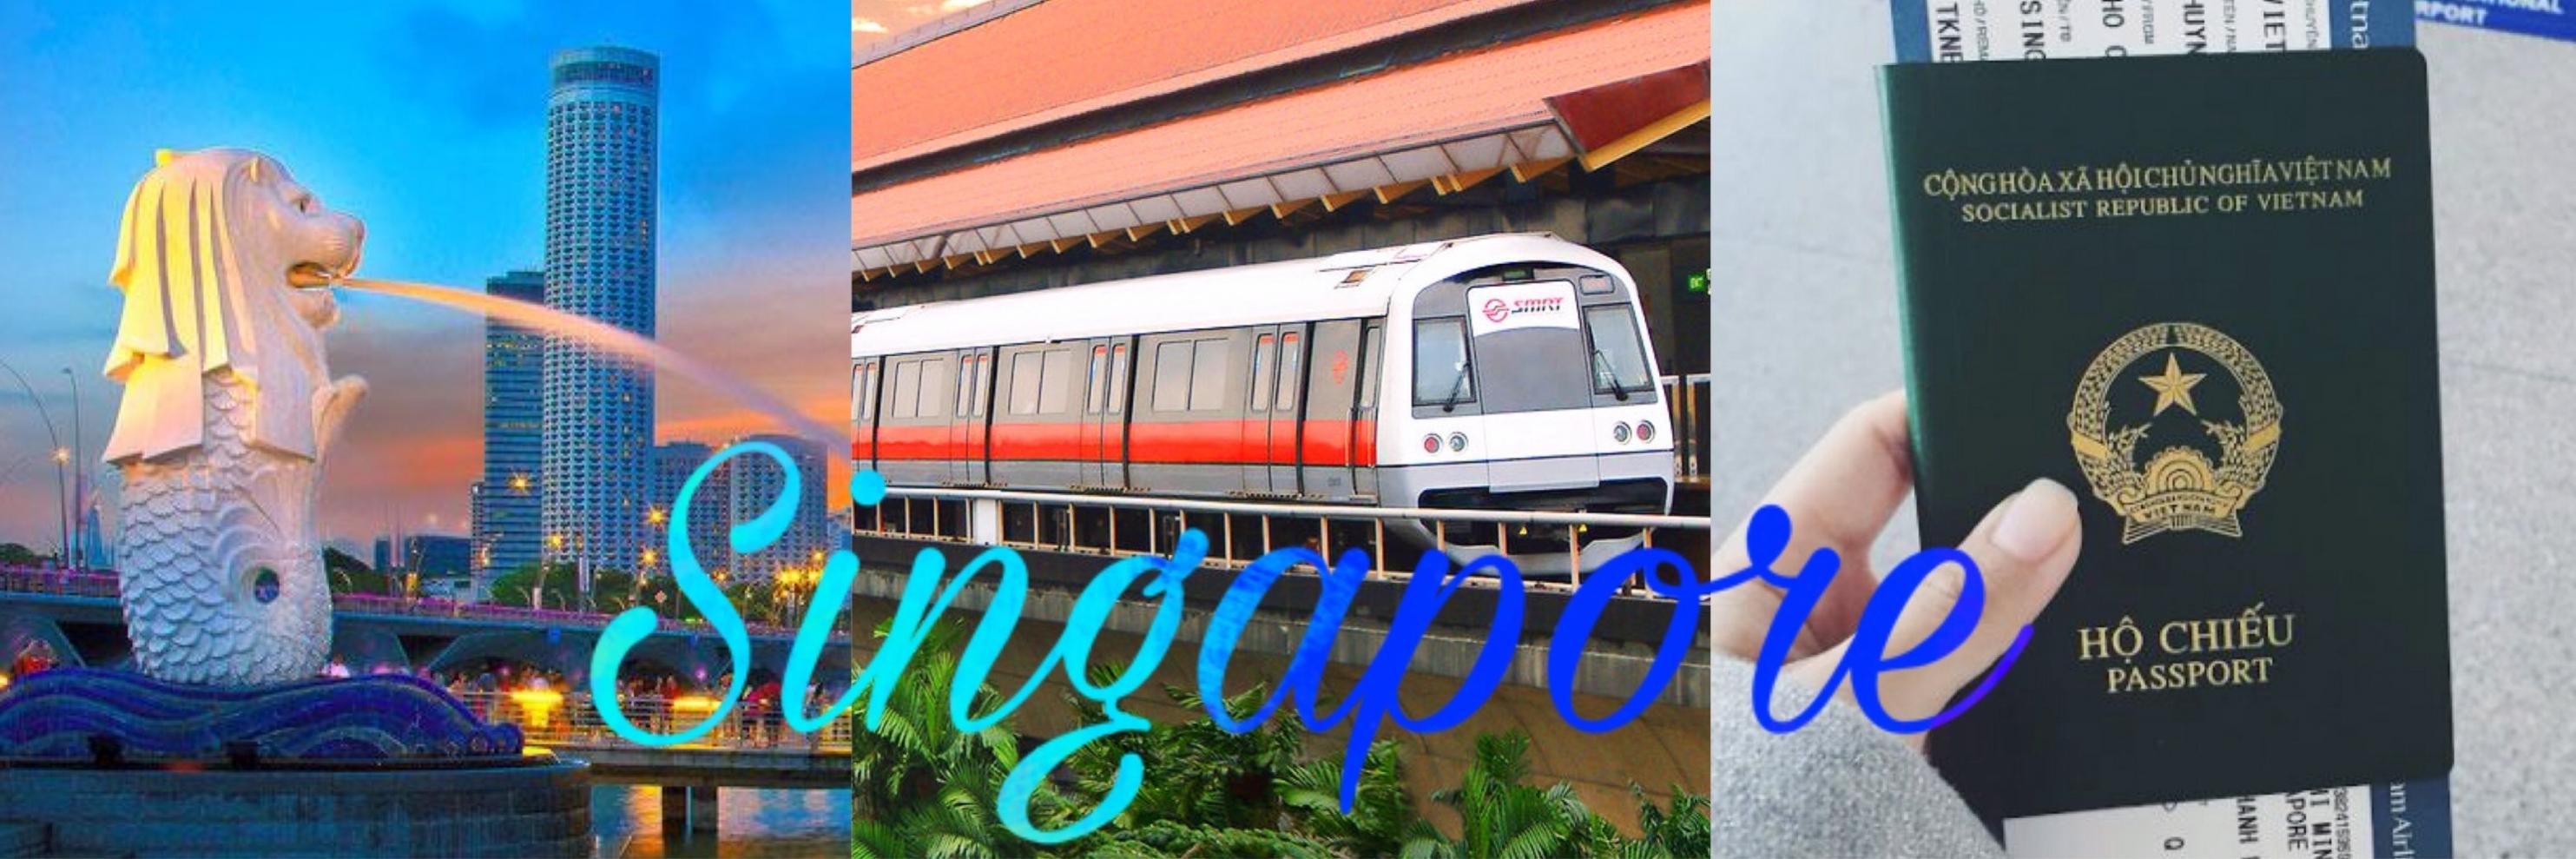 https://gody.vn/blog/hothikieutrinh8470/post/kinh-nghiem-nhap-canh-singapore-va-di-tau-dien-ngam-mrt-cho-nhung-ban-lan-dau-den-sing-1427